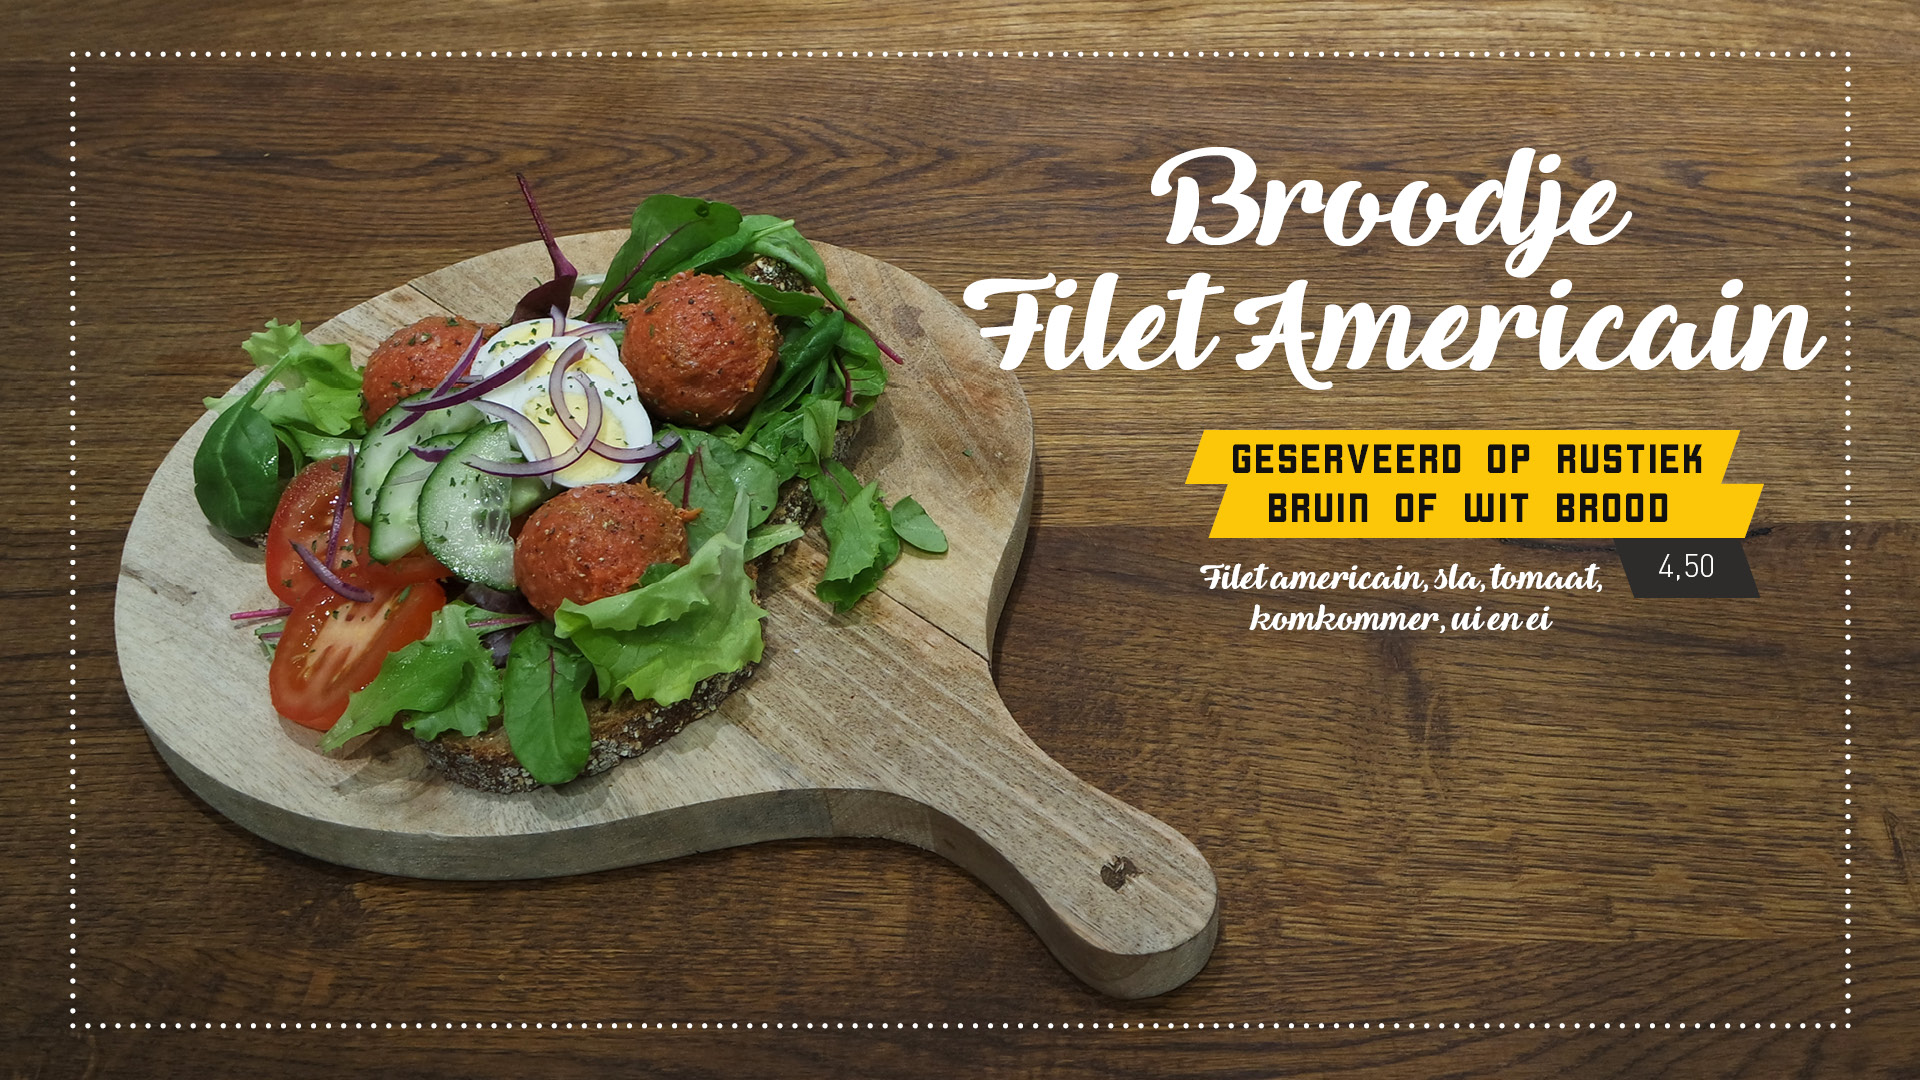 broodje-filet-americain